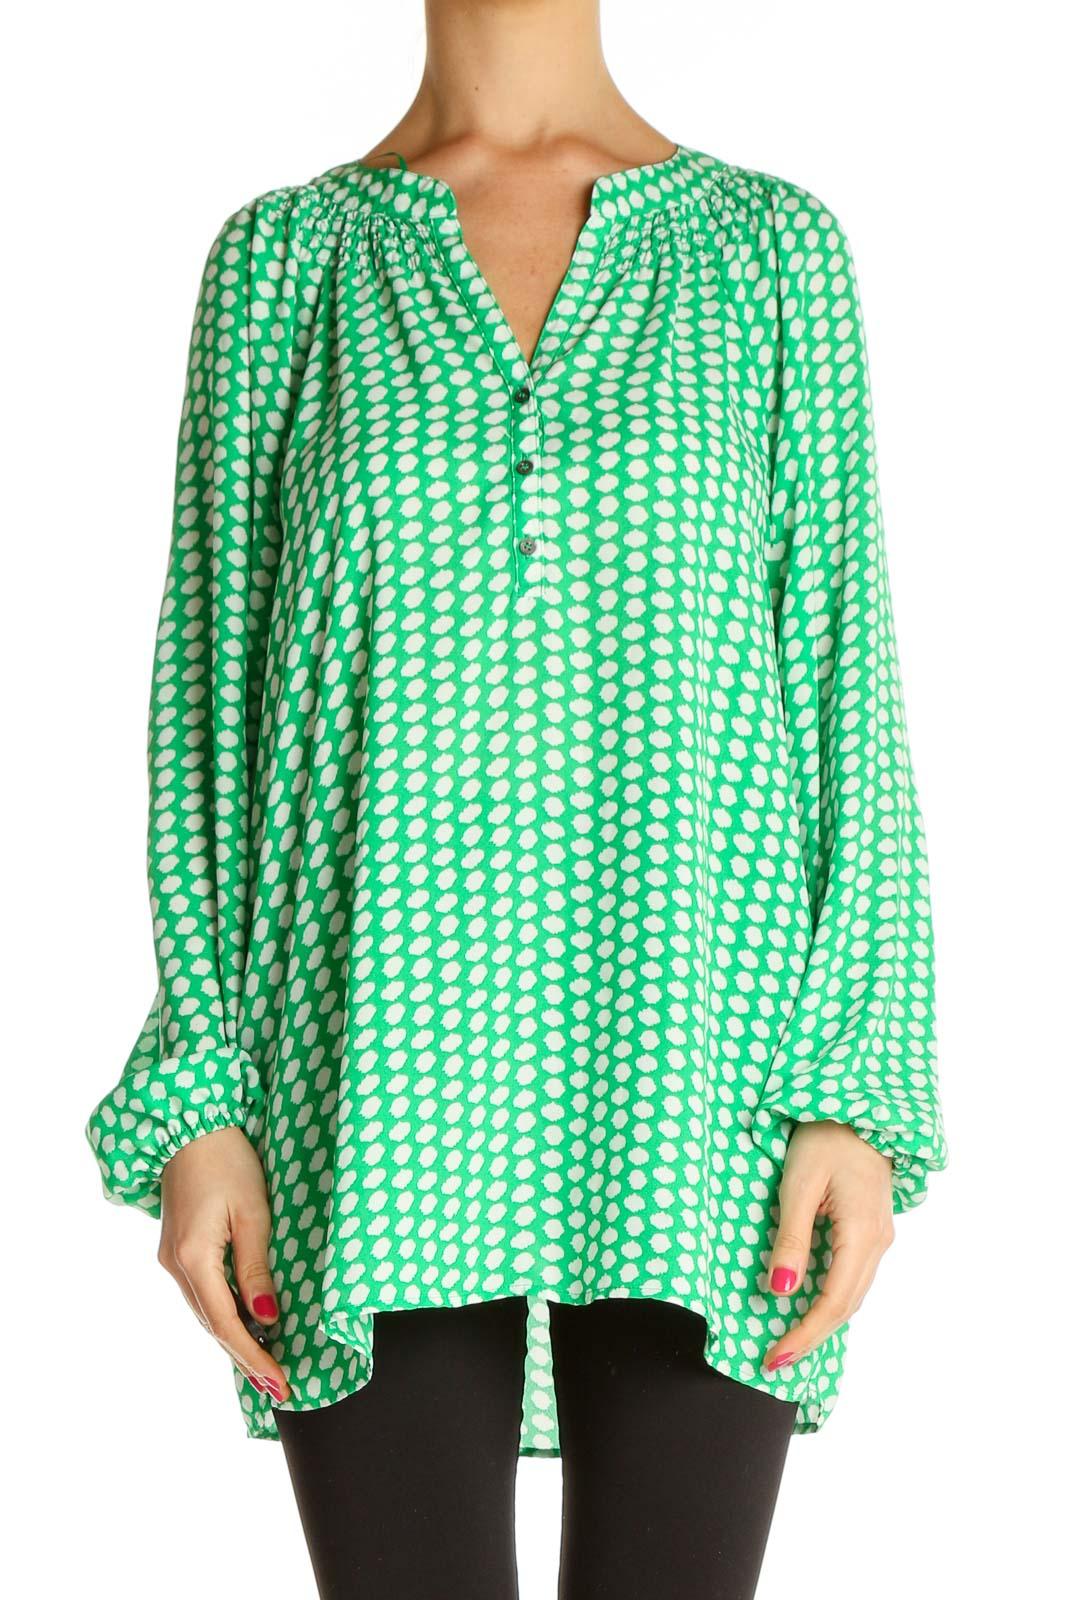 Green Polka Dot Retro Blouse Front